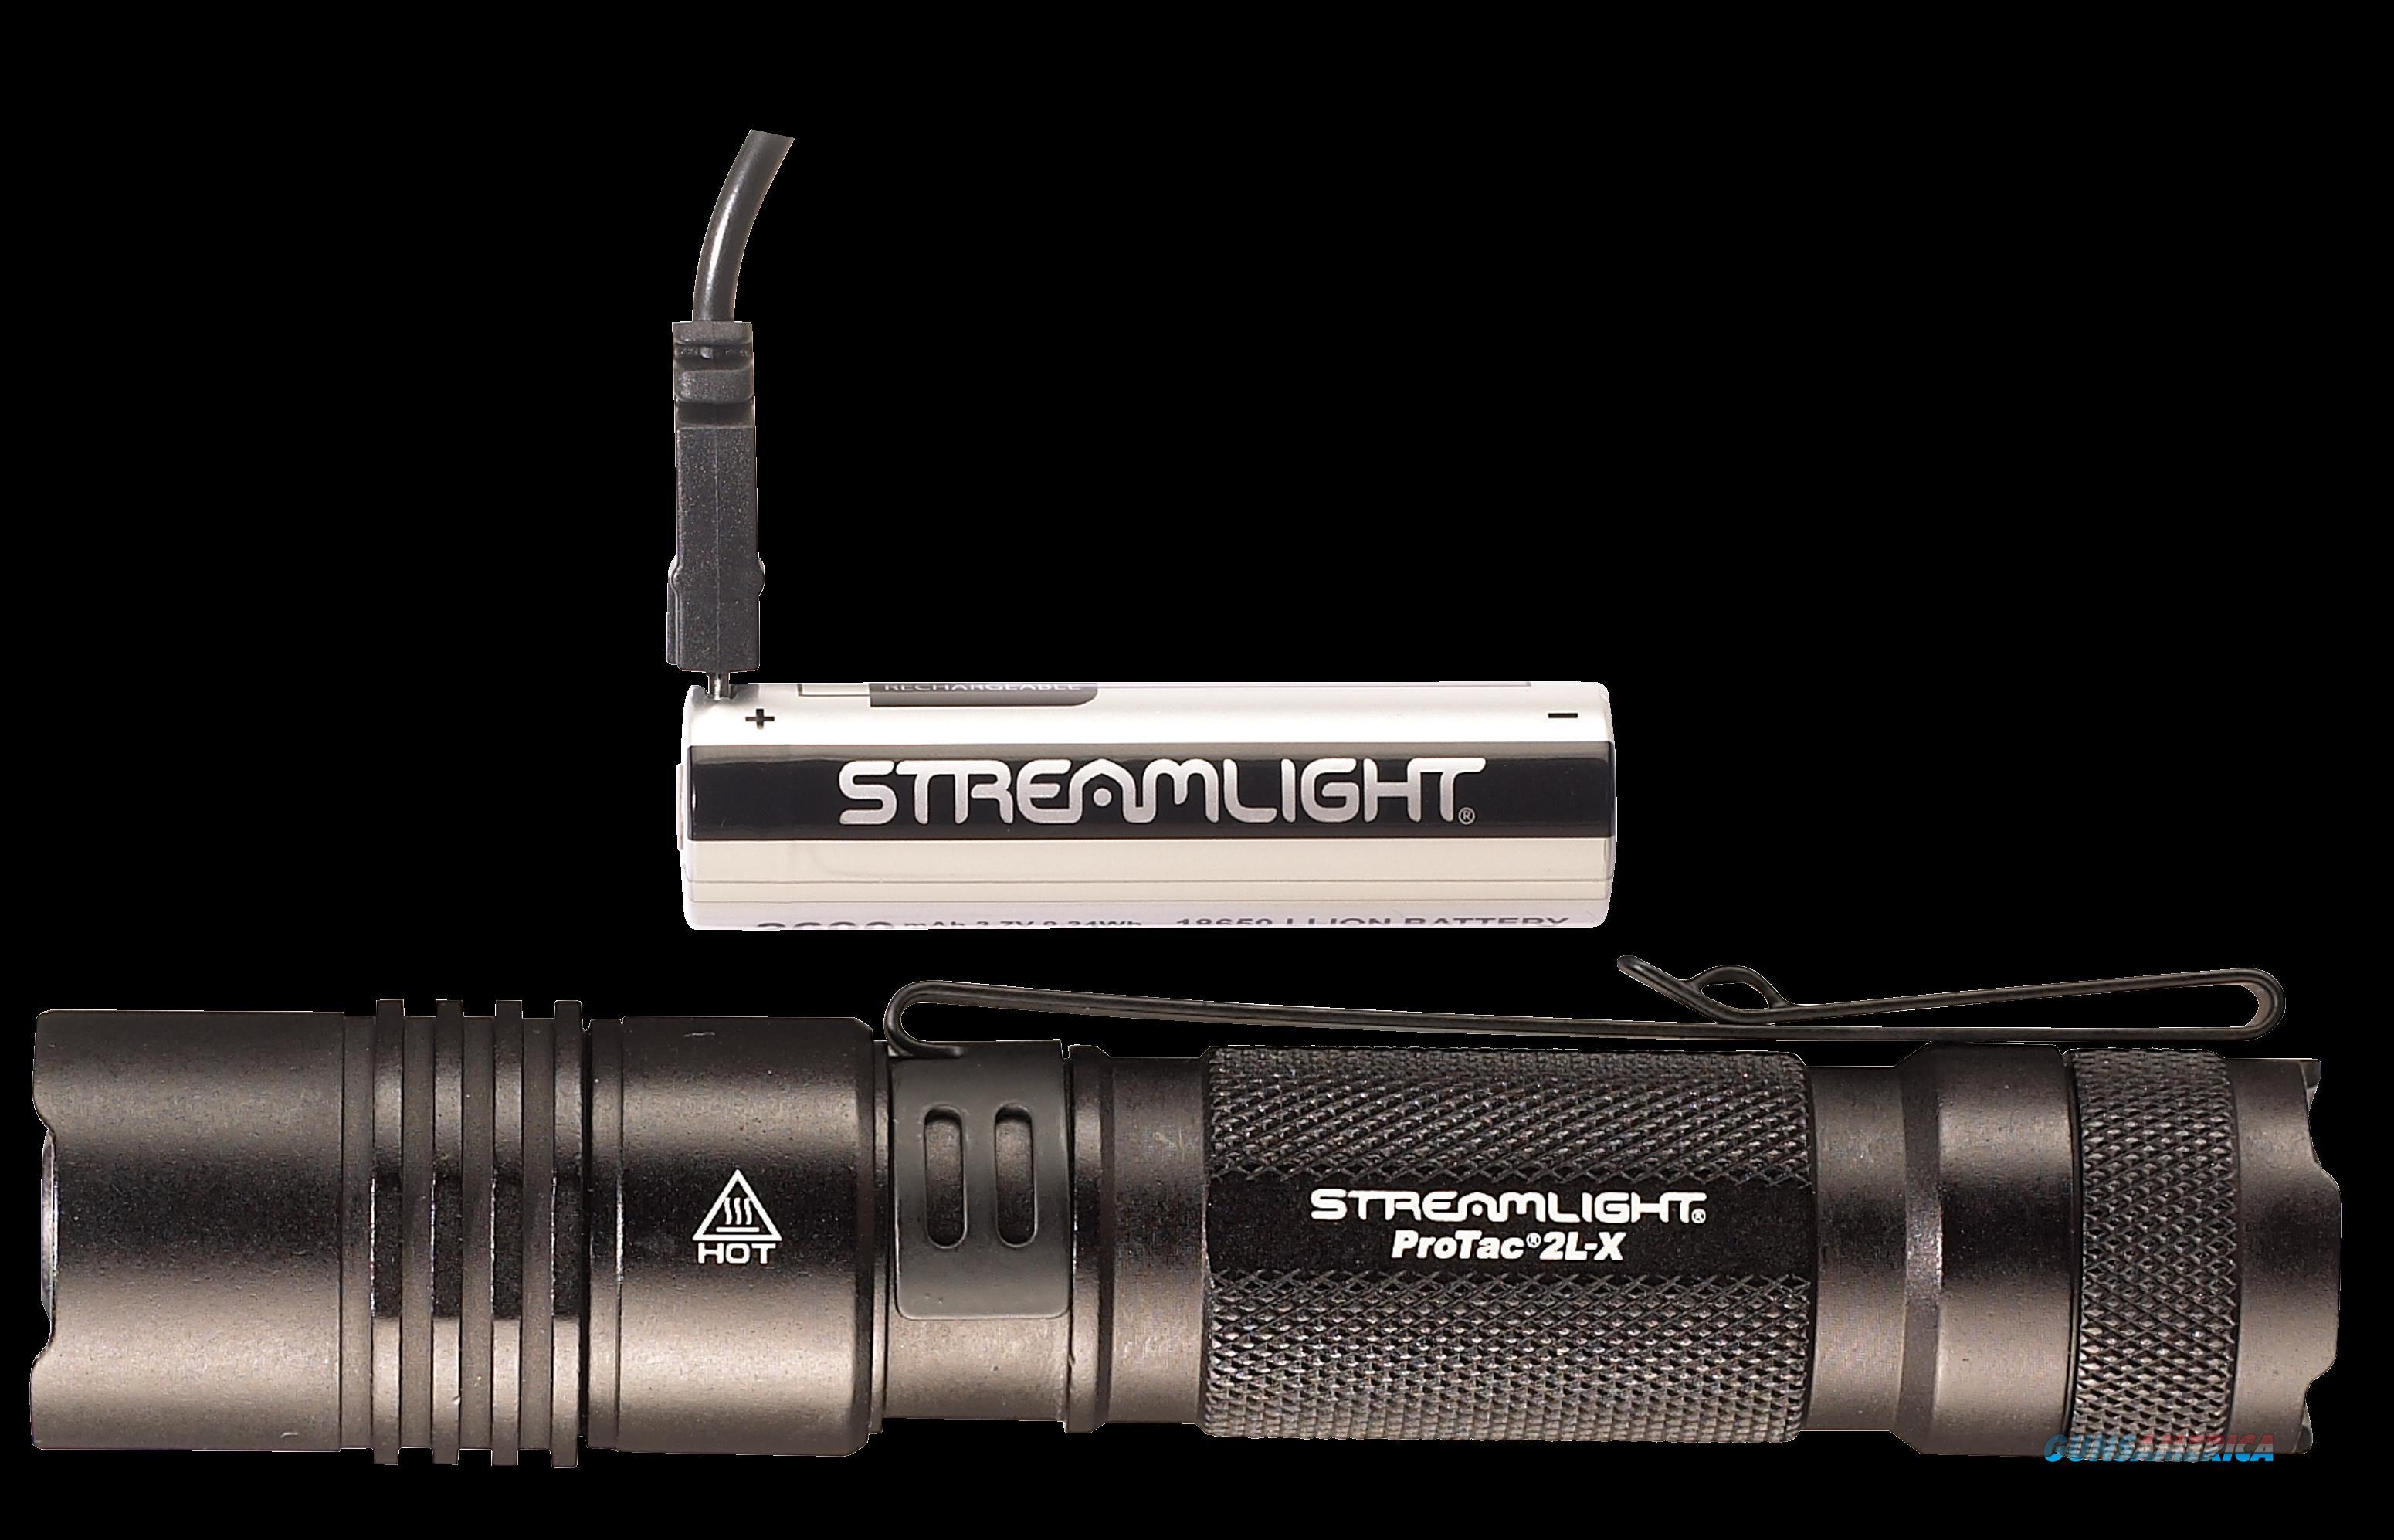 Streamlight Protac 2l-x, Stl 88082  Protac 2lx Usb  Guns > Pistols > 1911 Pistol Copies (non-Colt)